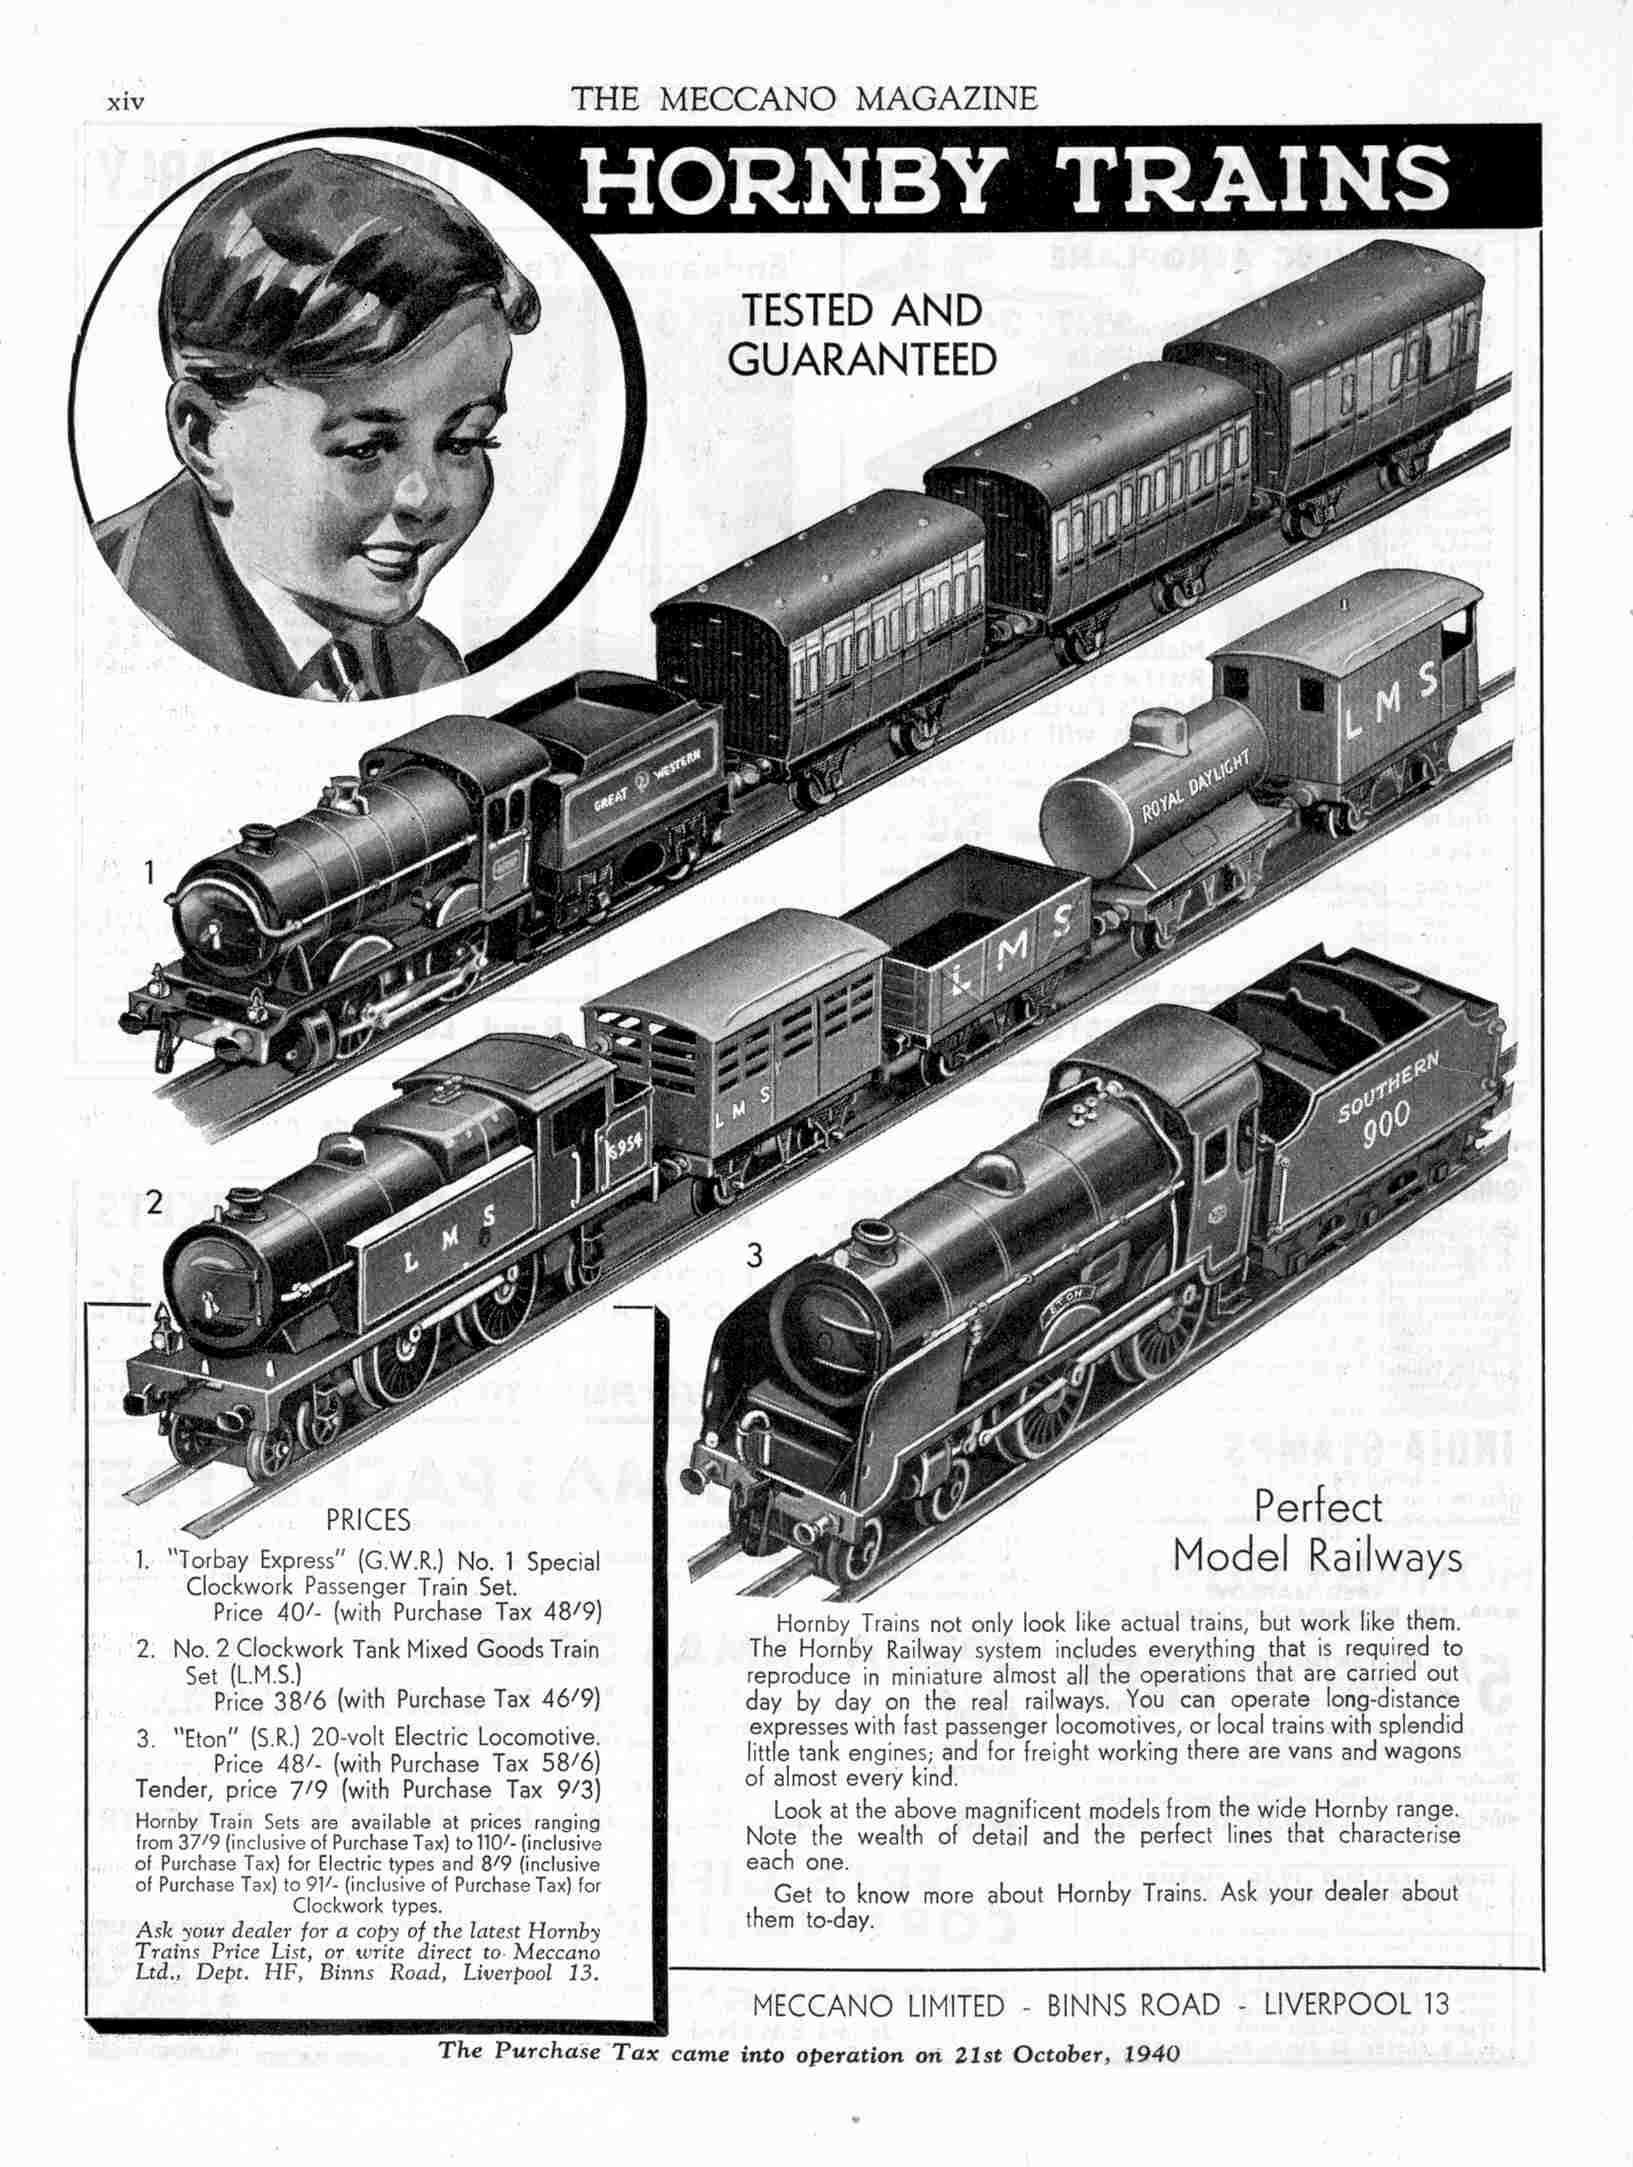 UK Meccano Magazine December 1940 Page xiv